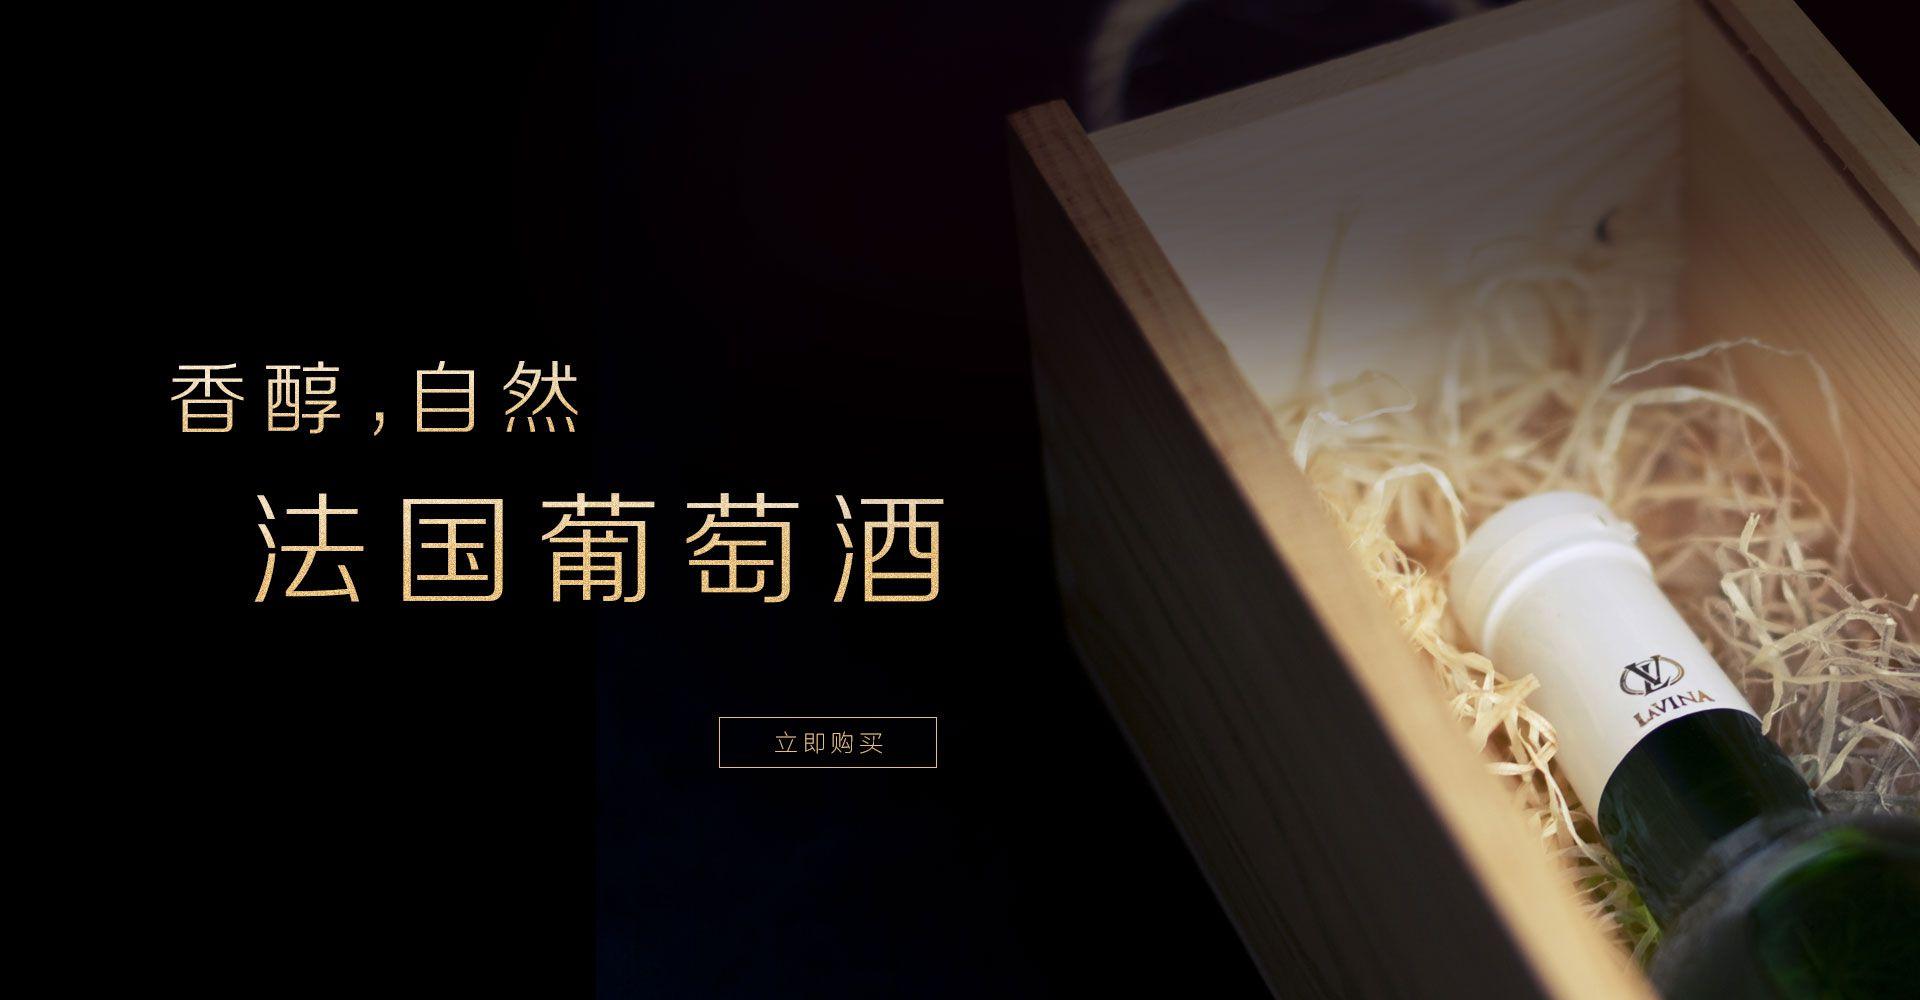 骞荤��(deng)2